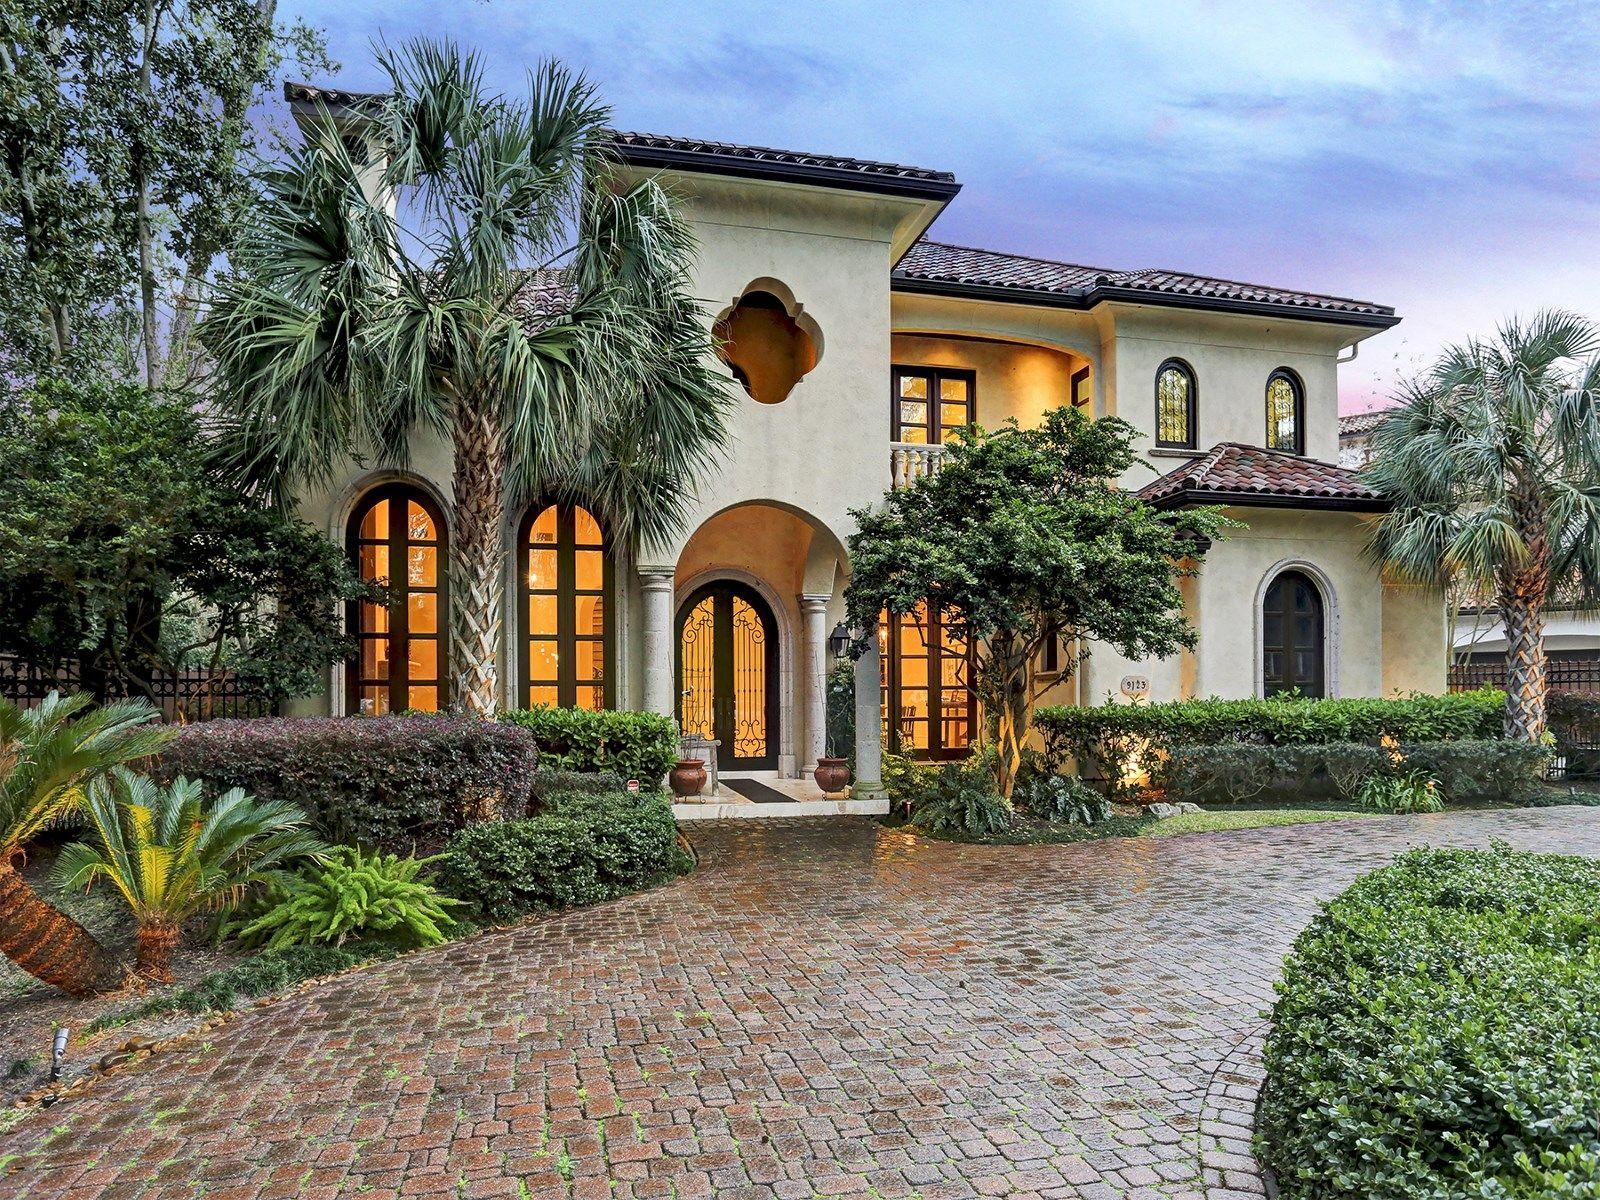 9123 Chatsworth, Houston TX Single Family Home - Houston Real Estate ...